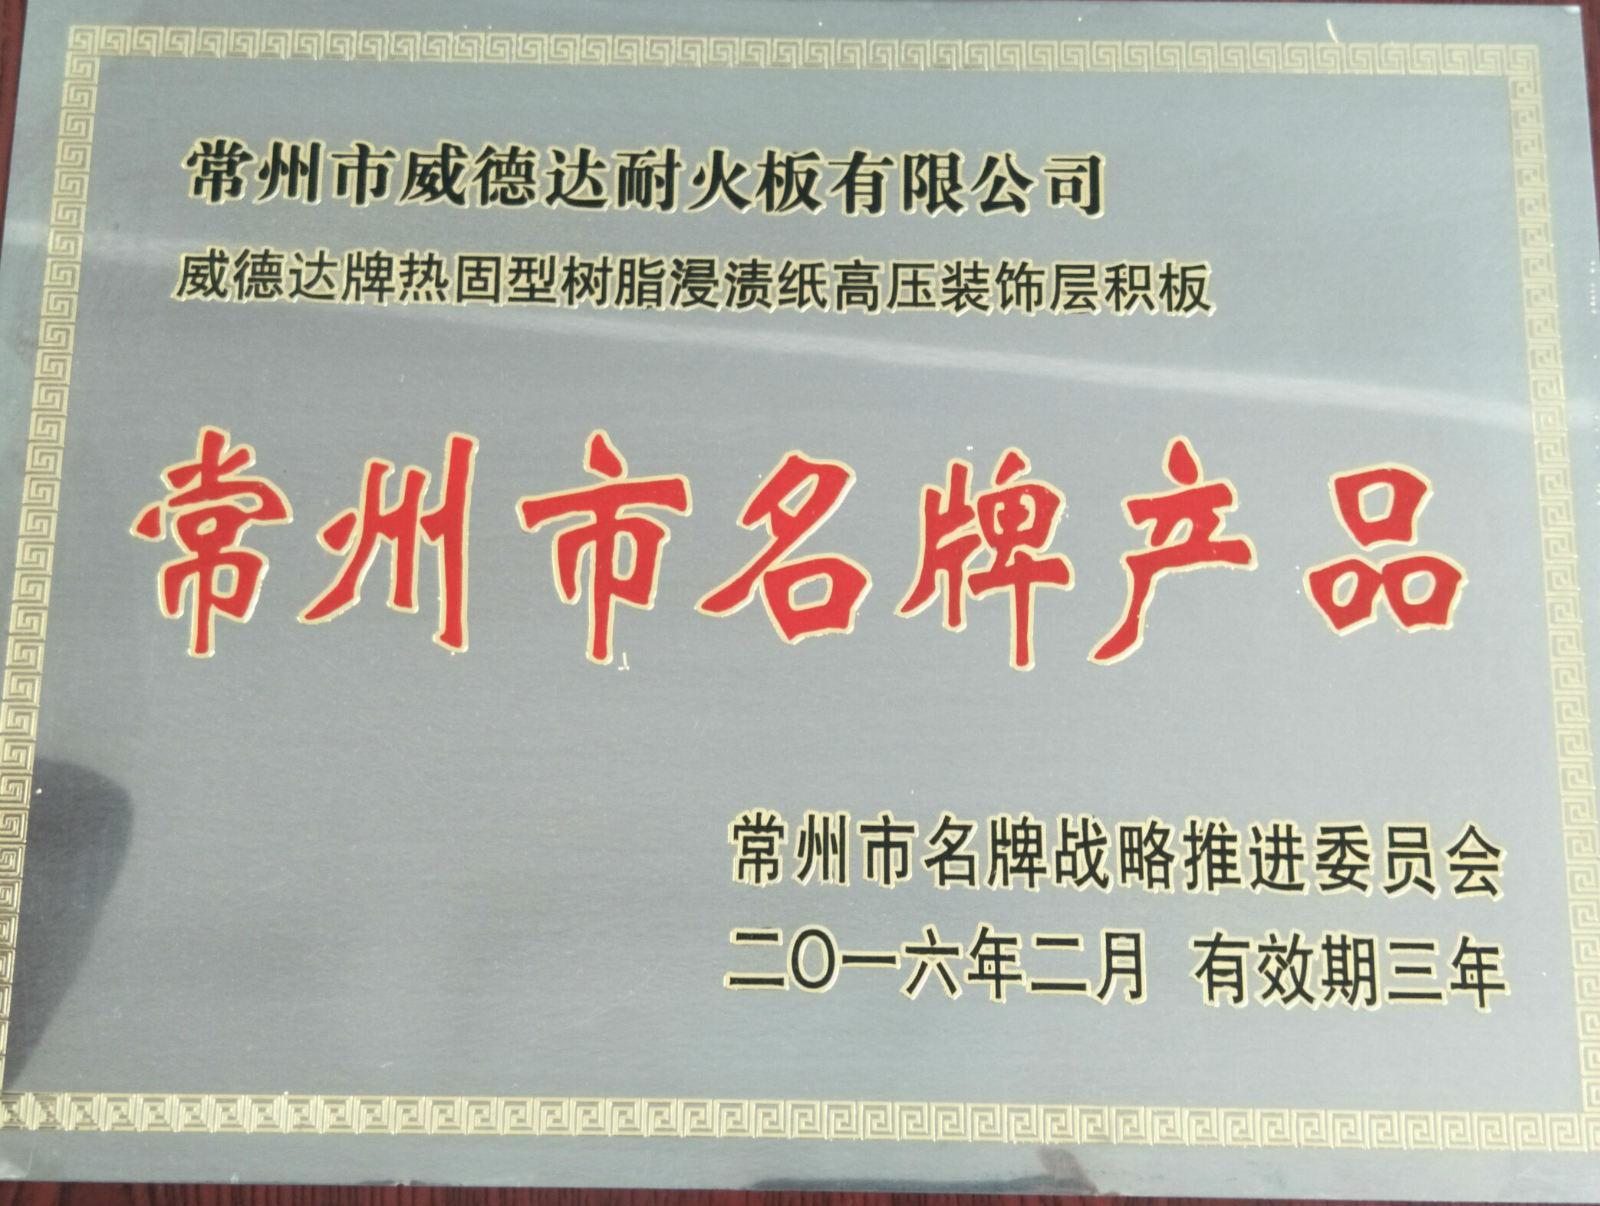 Changzhou famous brand product